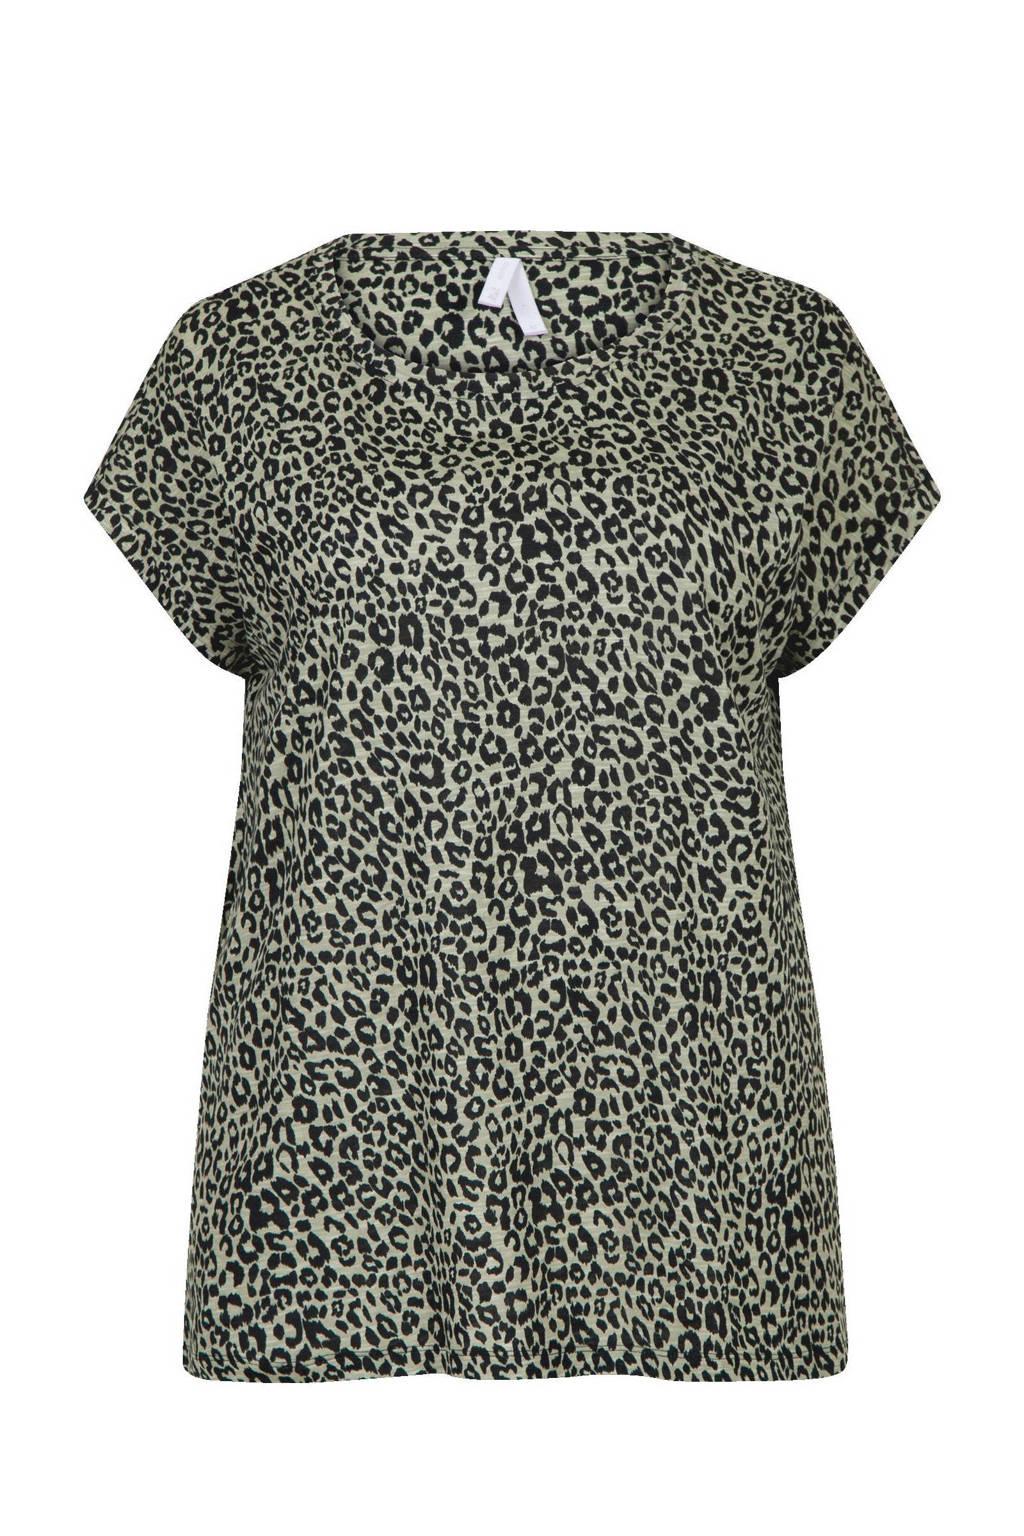 Miss Etam Plus T-shirt met panterprint zand/zwart, Zand/zwart